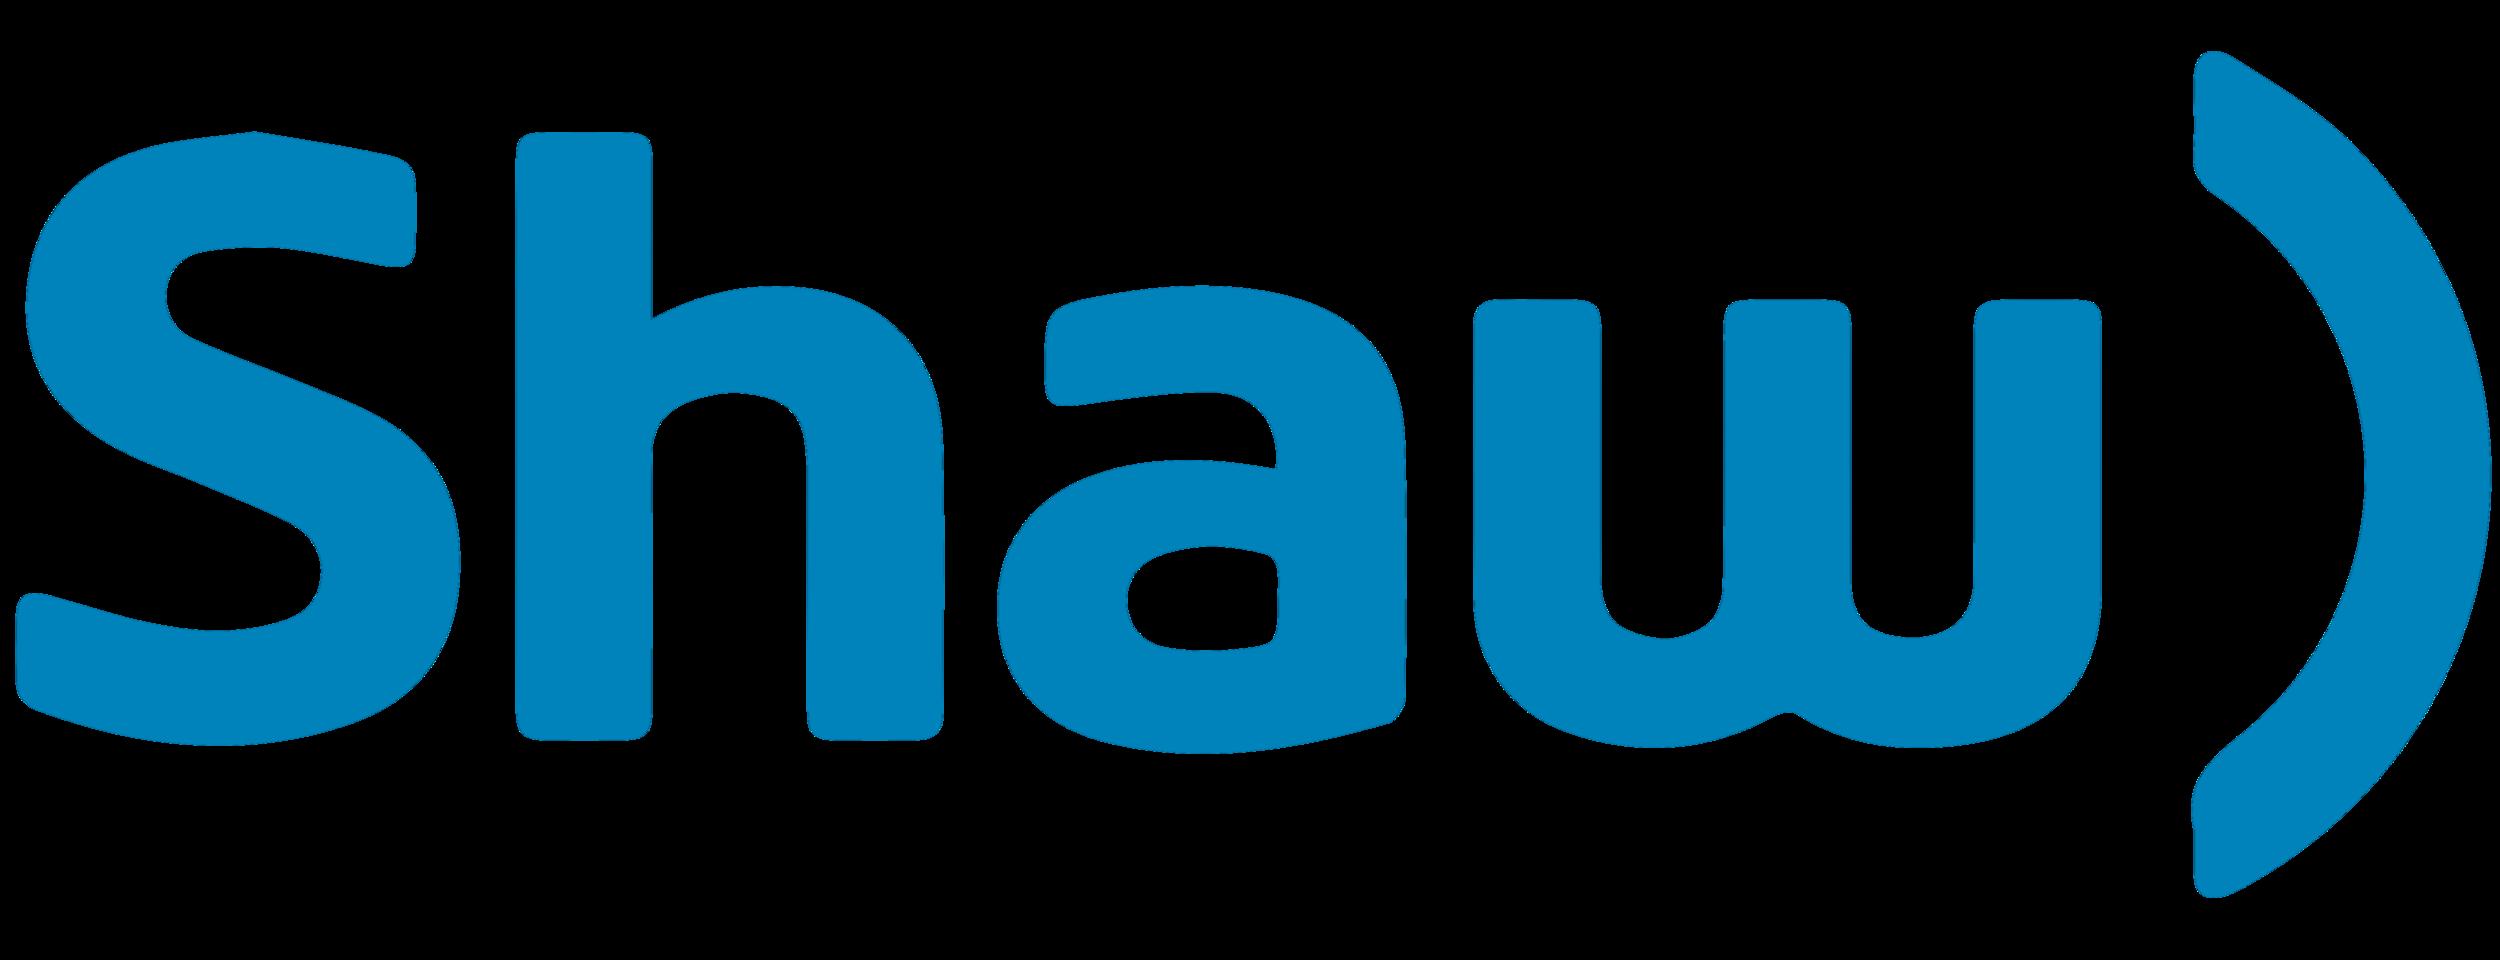 Shaw_logo.png